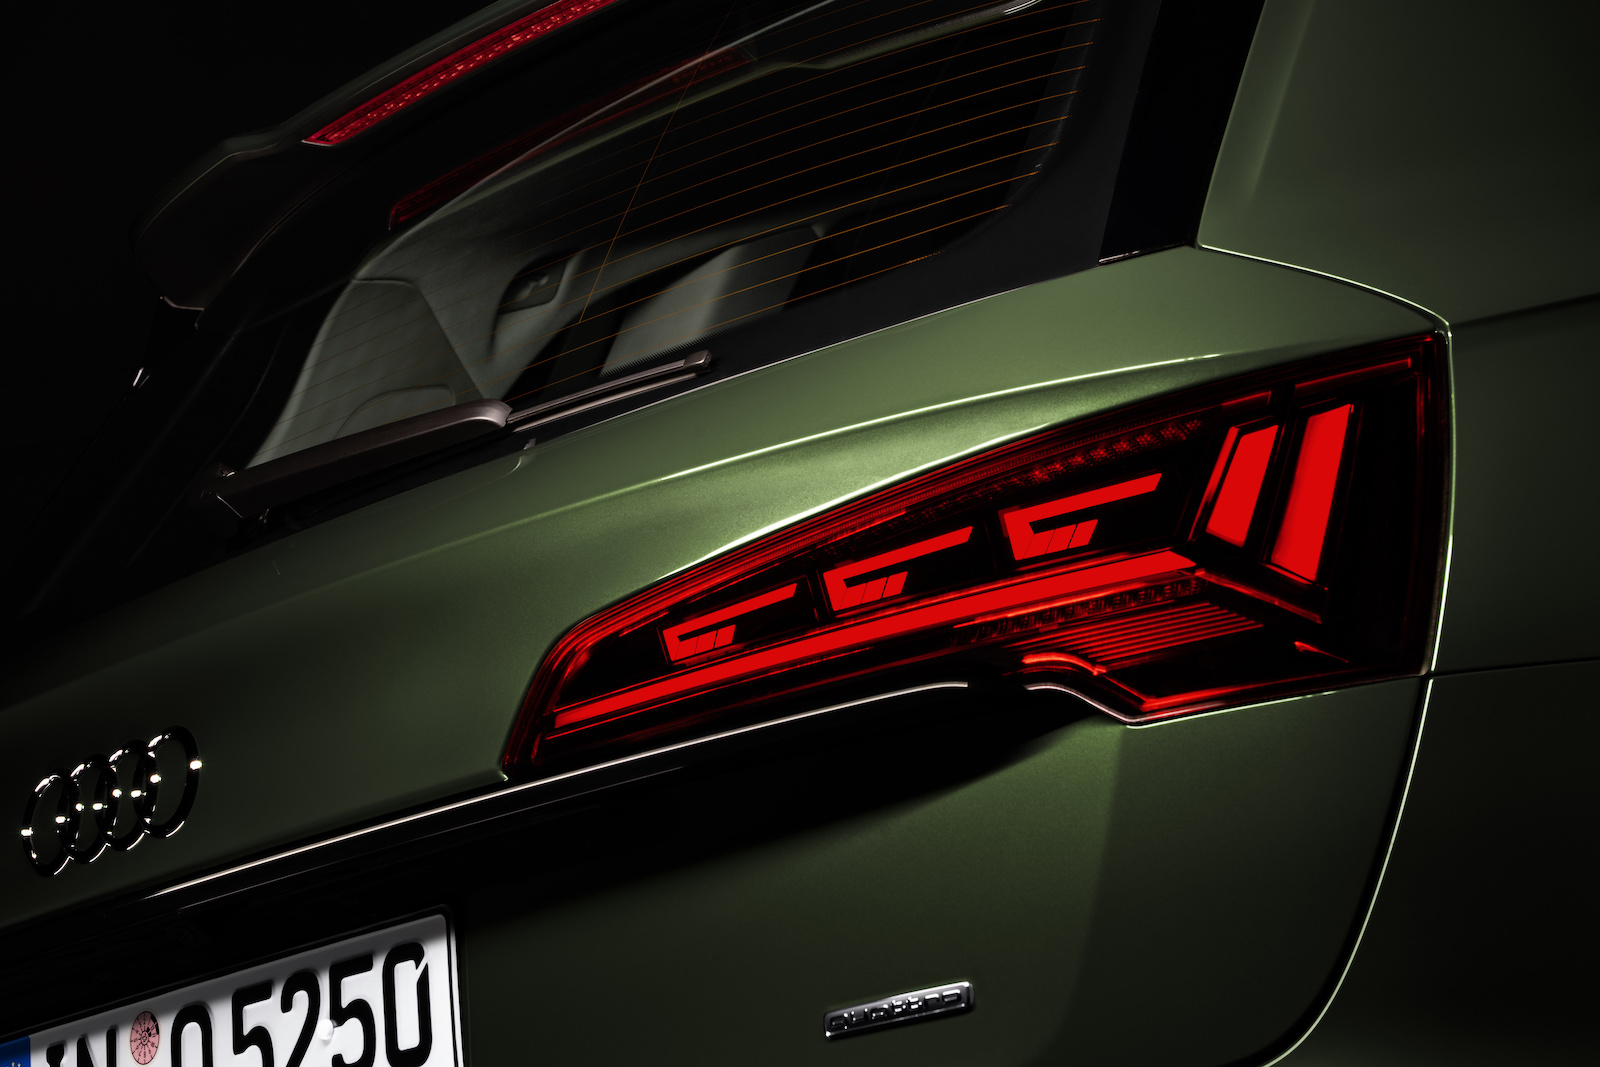 Audi Q5 40 Tdi